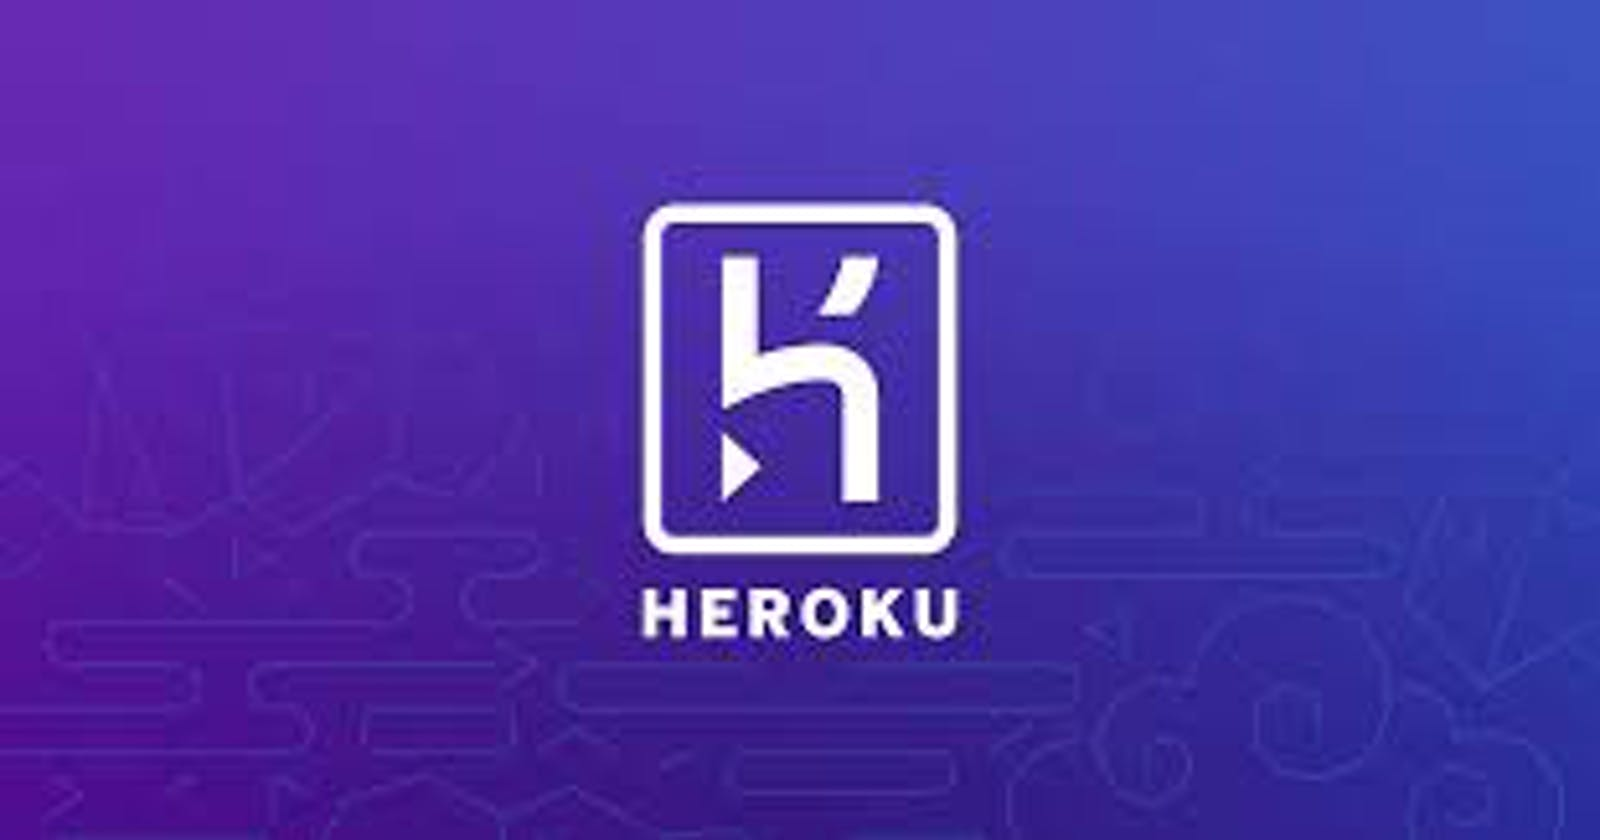 How to keep a free Heroku Dyno up with Github Actions